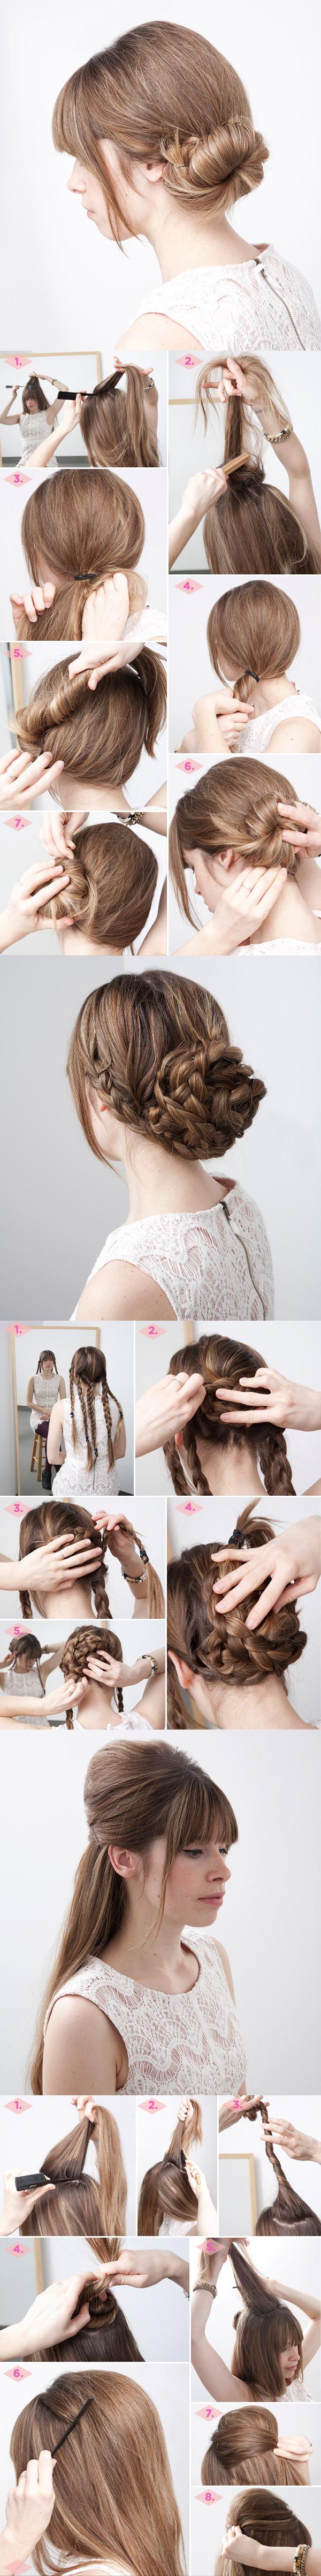 Surprising 13 Rather Simple Bun Hairstyles Tutorials For 2014 Pretty Designs Short Hairstyles For Black Women Fulllsitofus